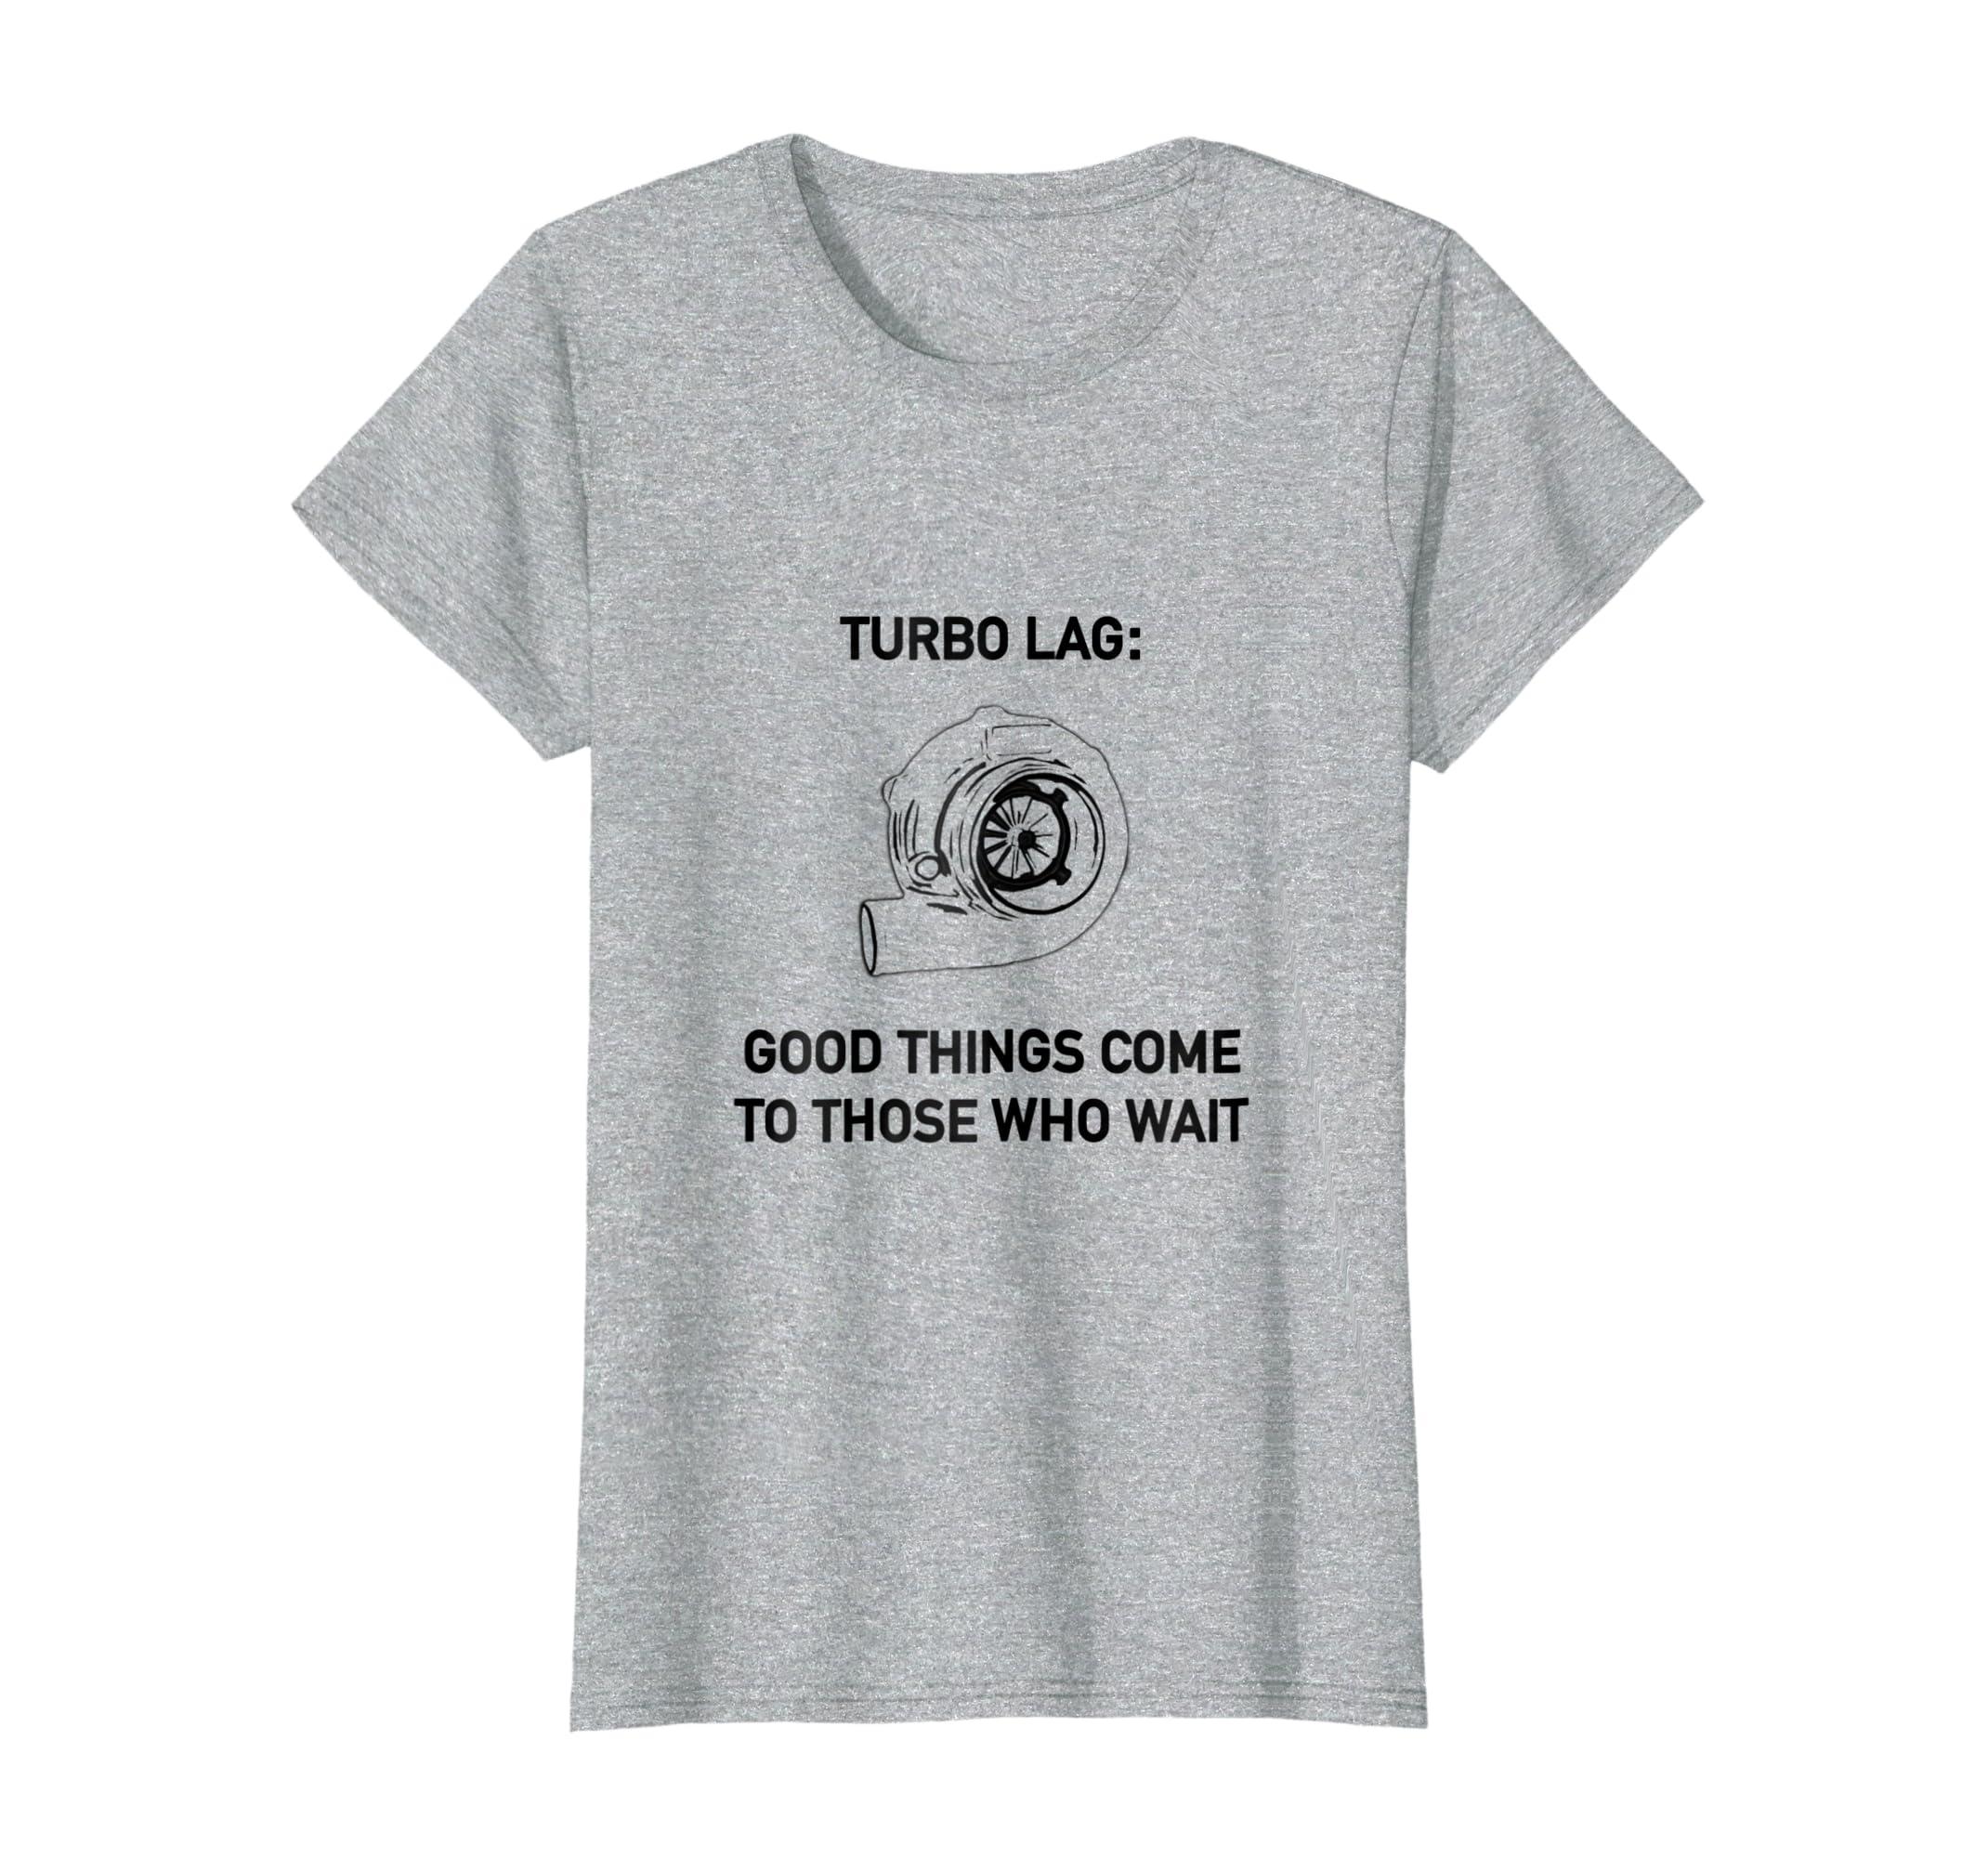 Amazon.com: Turbo Lag: Good Things Come To Those Who Wait T-Shirt: Clothing